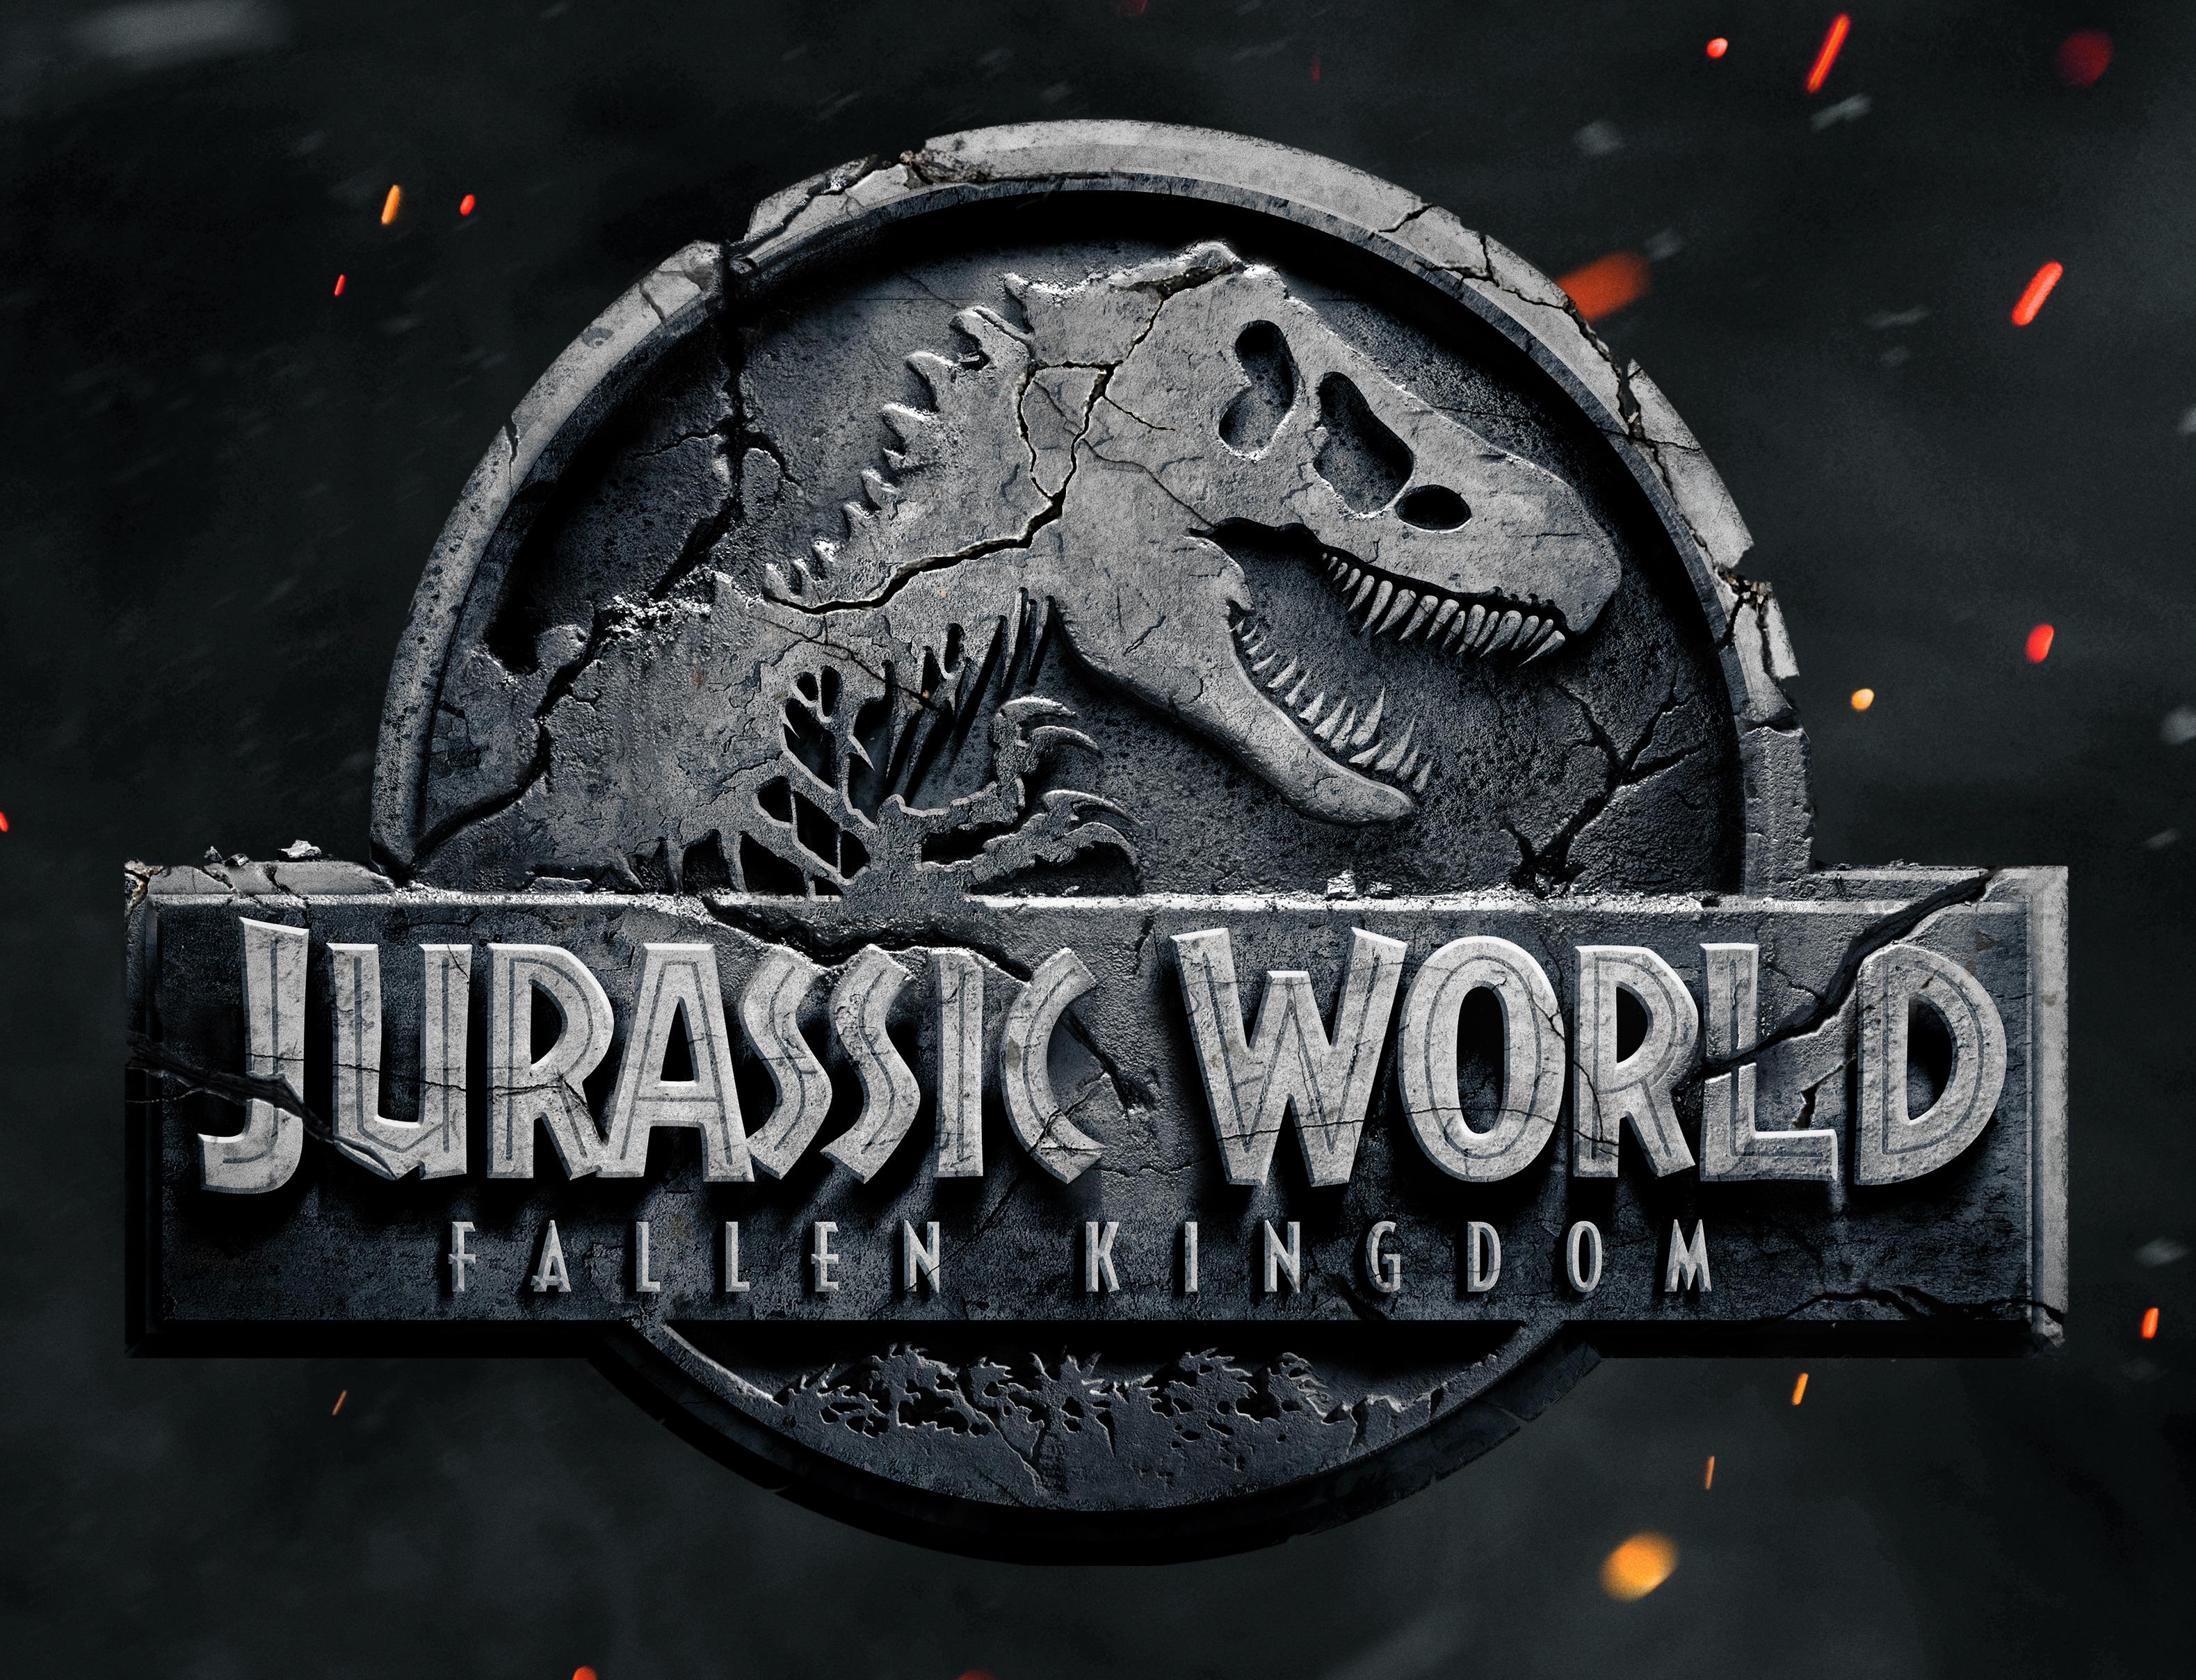 Jurassic World Fallen Kingdom 4k HD Movies 4k Wallpapers Images